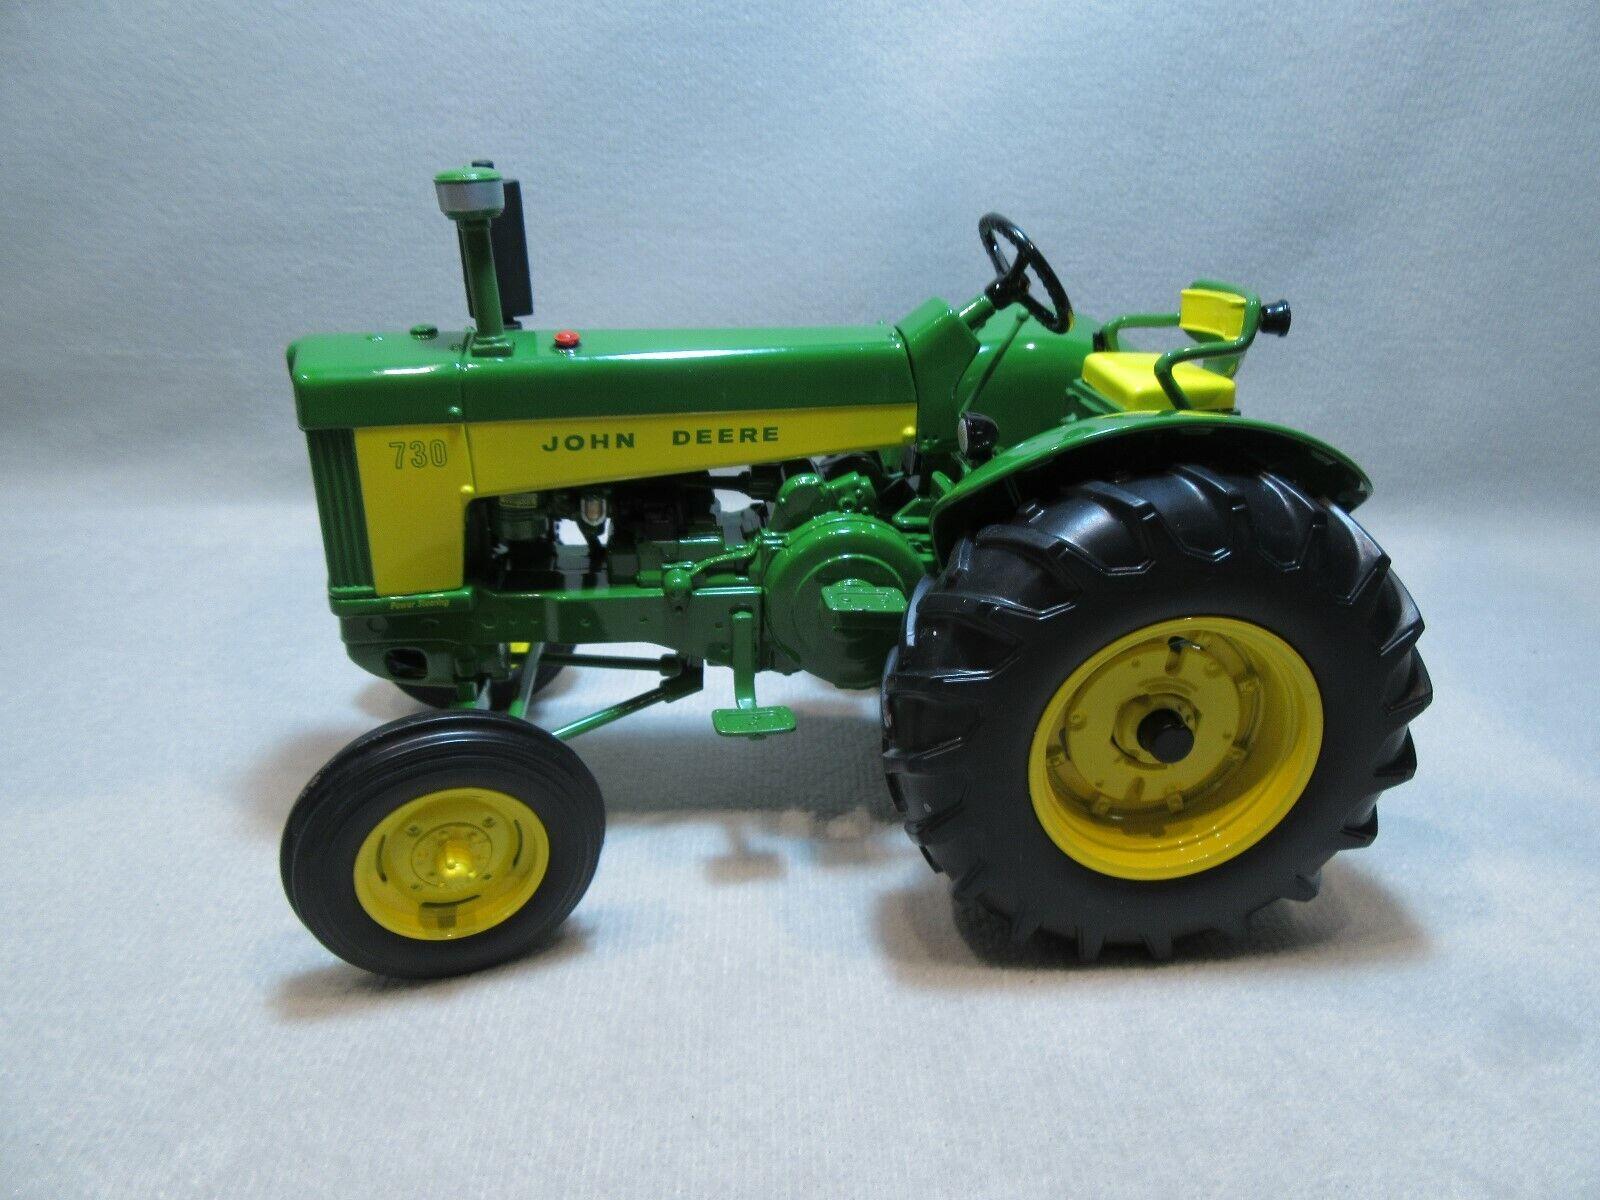 John Deere Toy Tractor 1 16 730 Standard Tread 1958-1960 Two Cylinder XVI